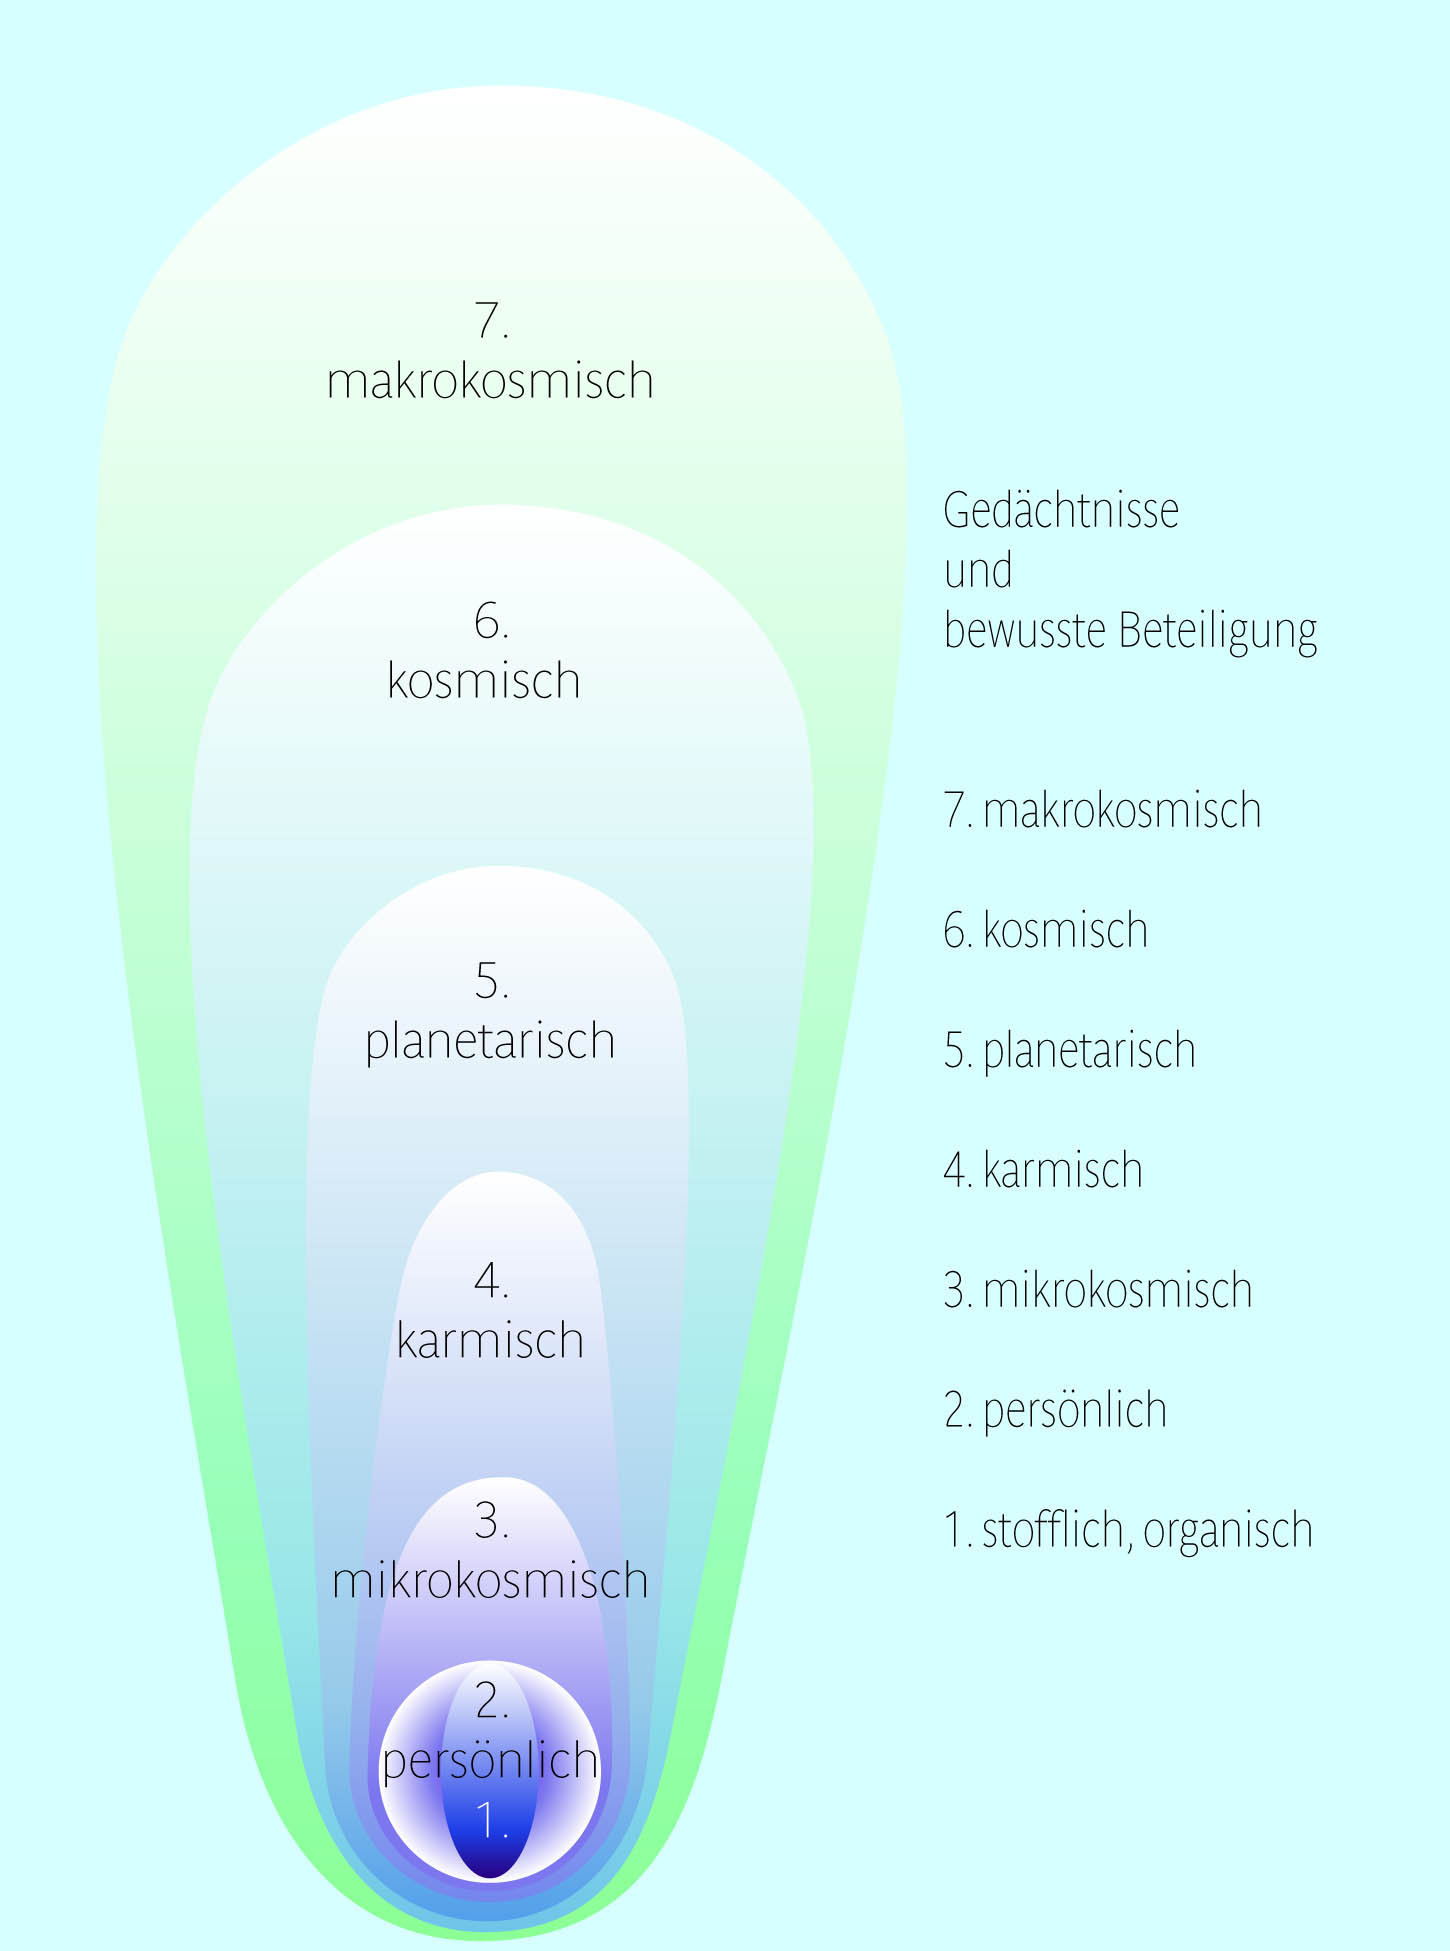 GedaechtnisKomet